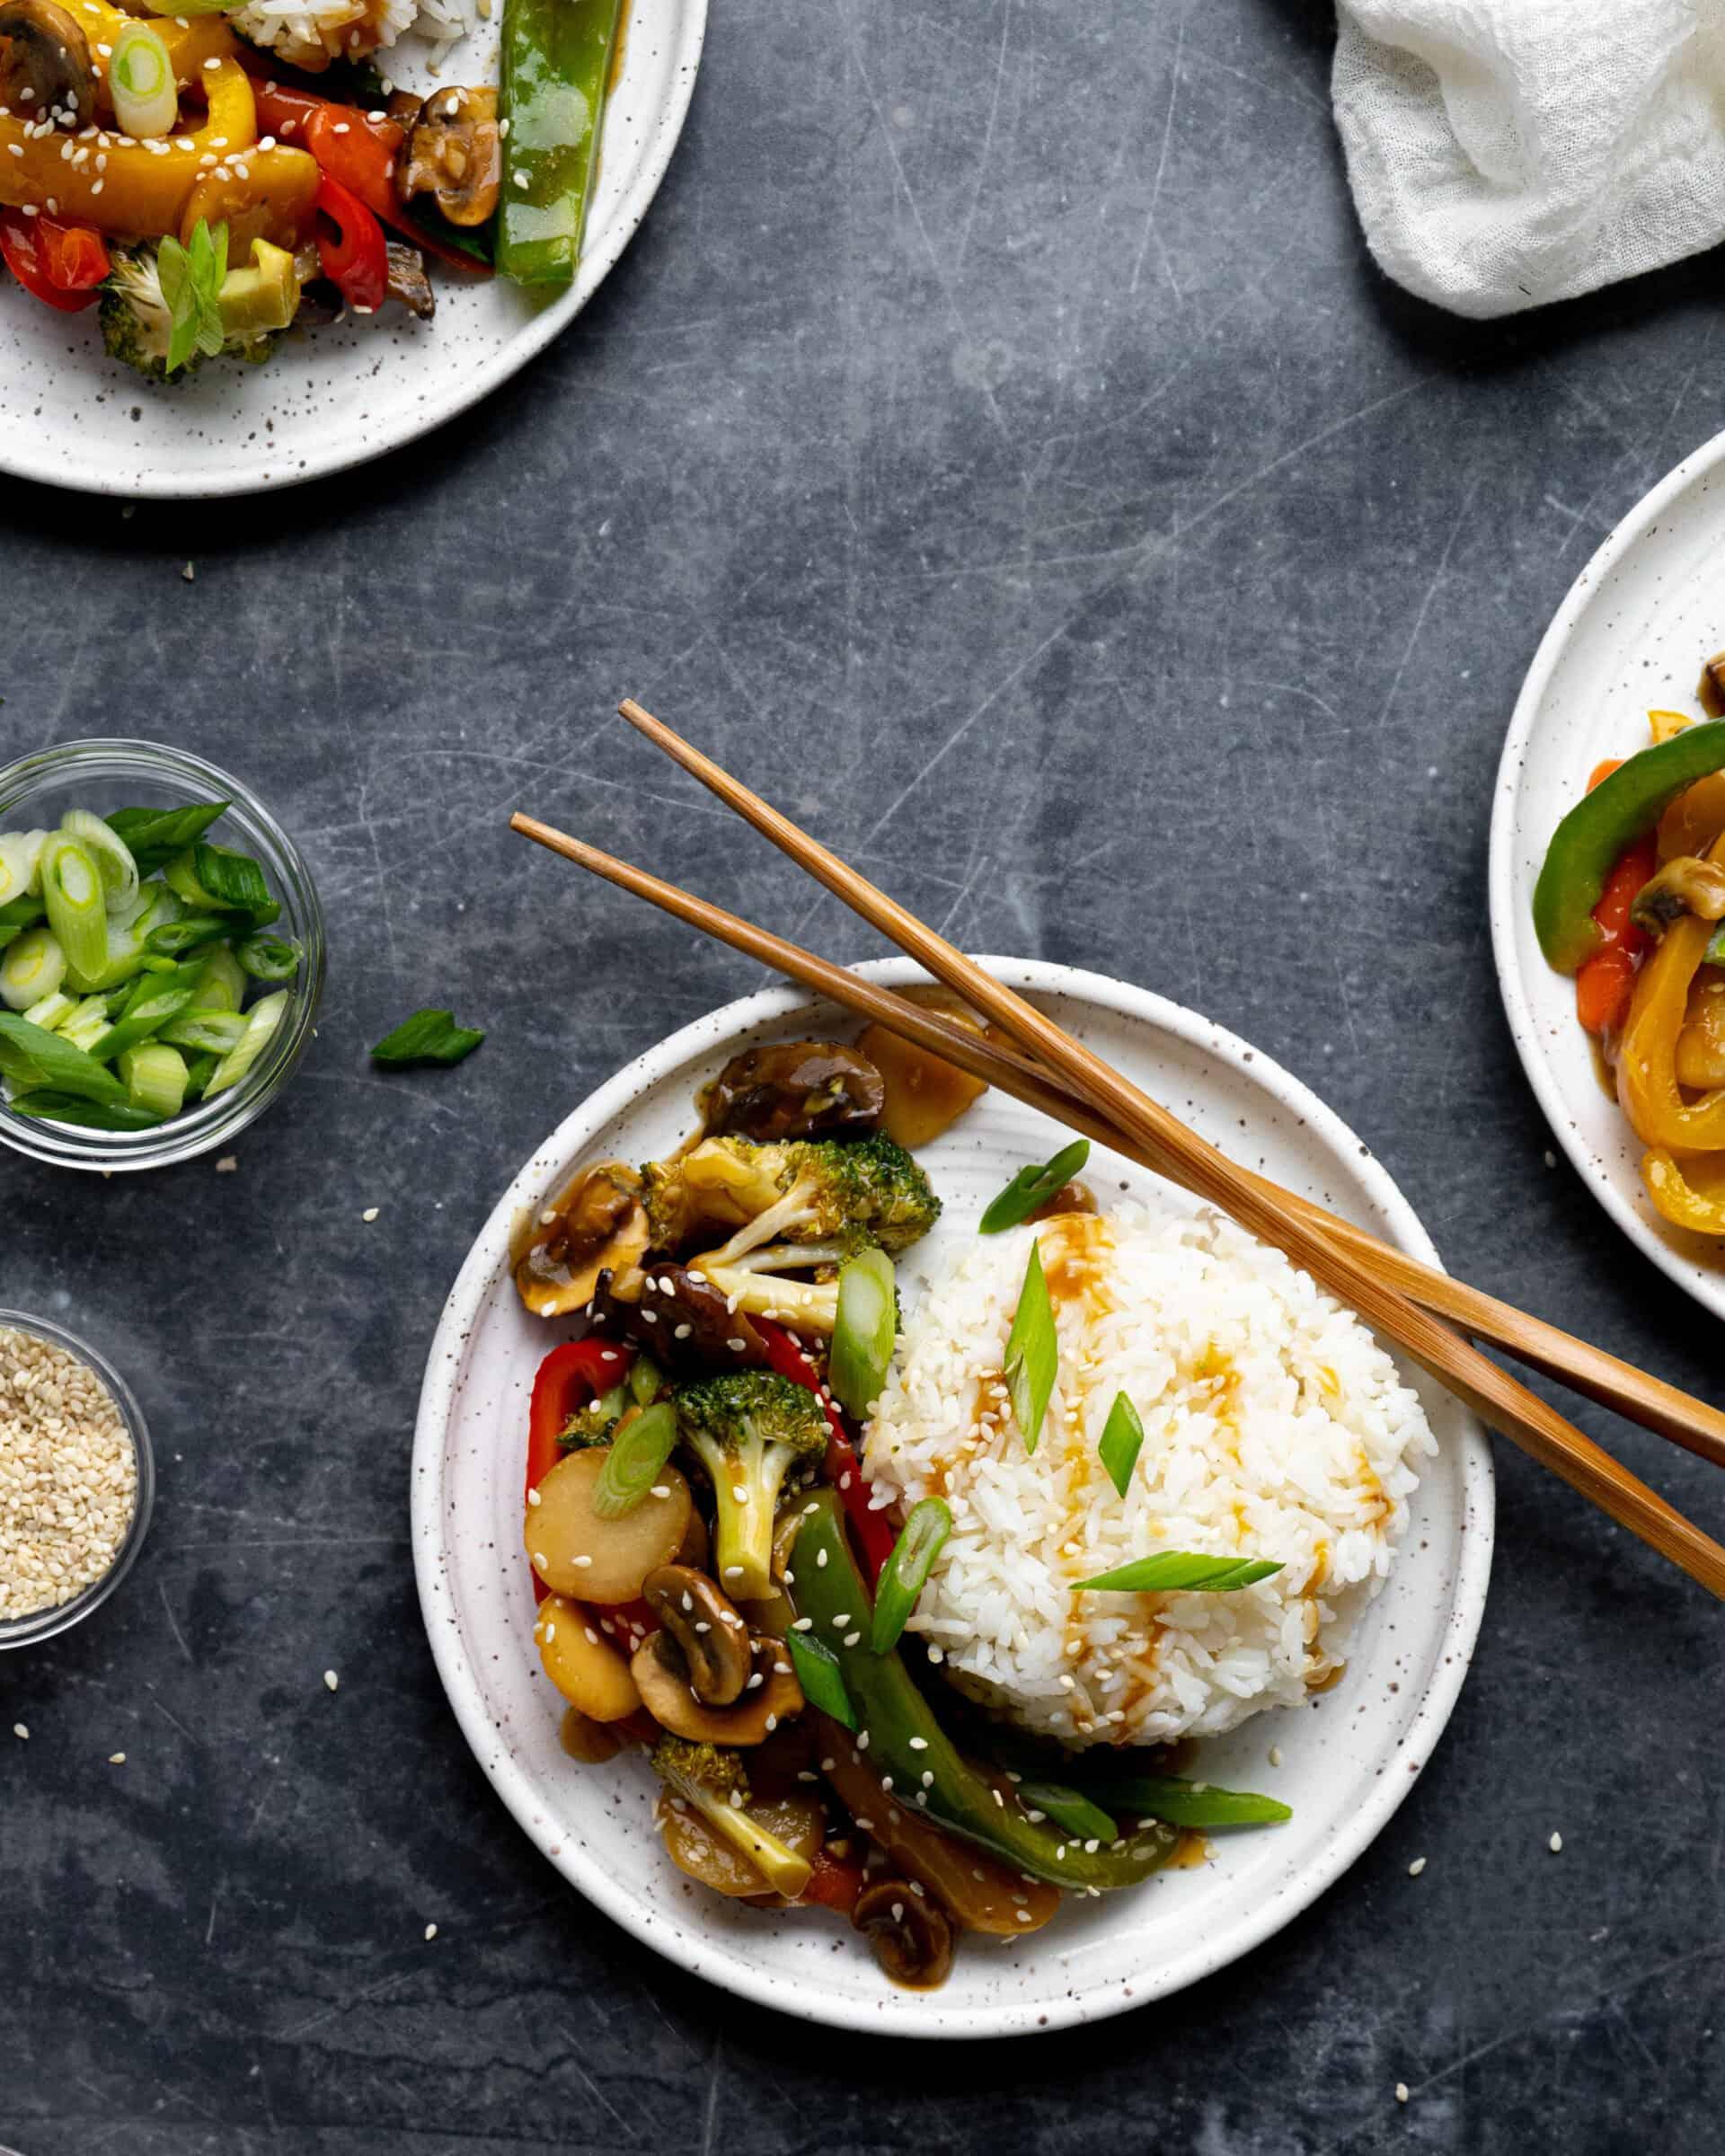 A veggie stir fry on plates